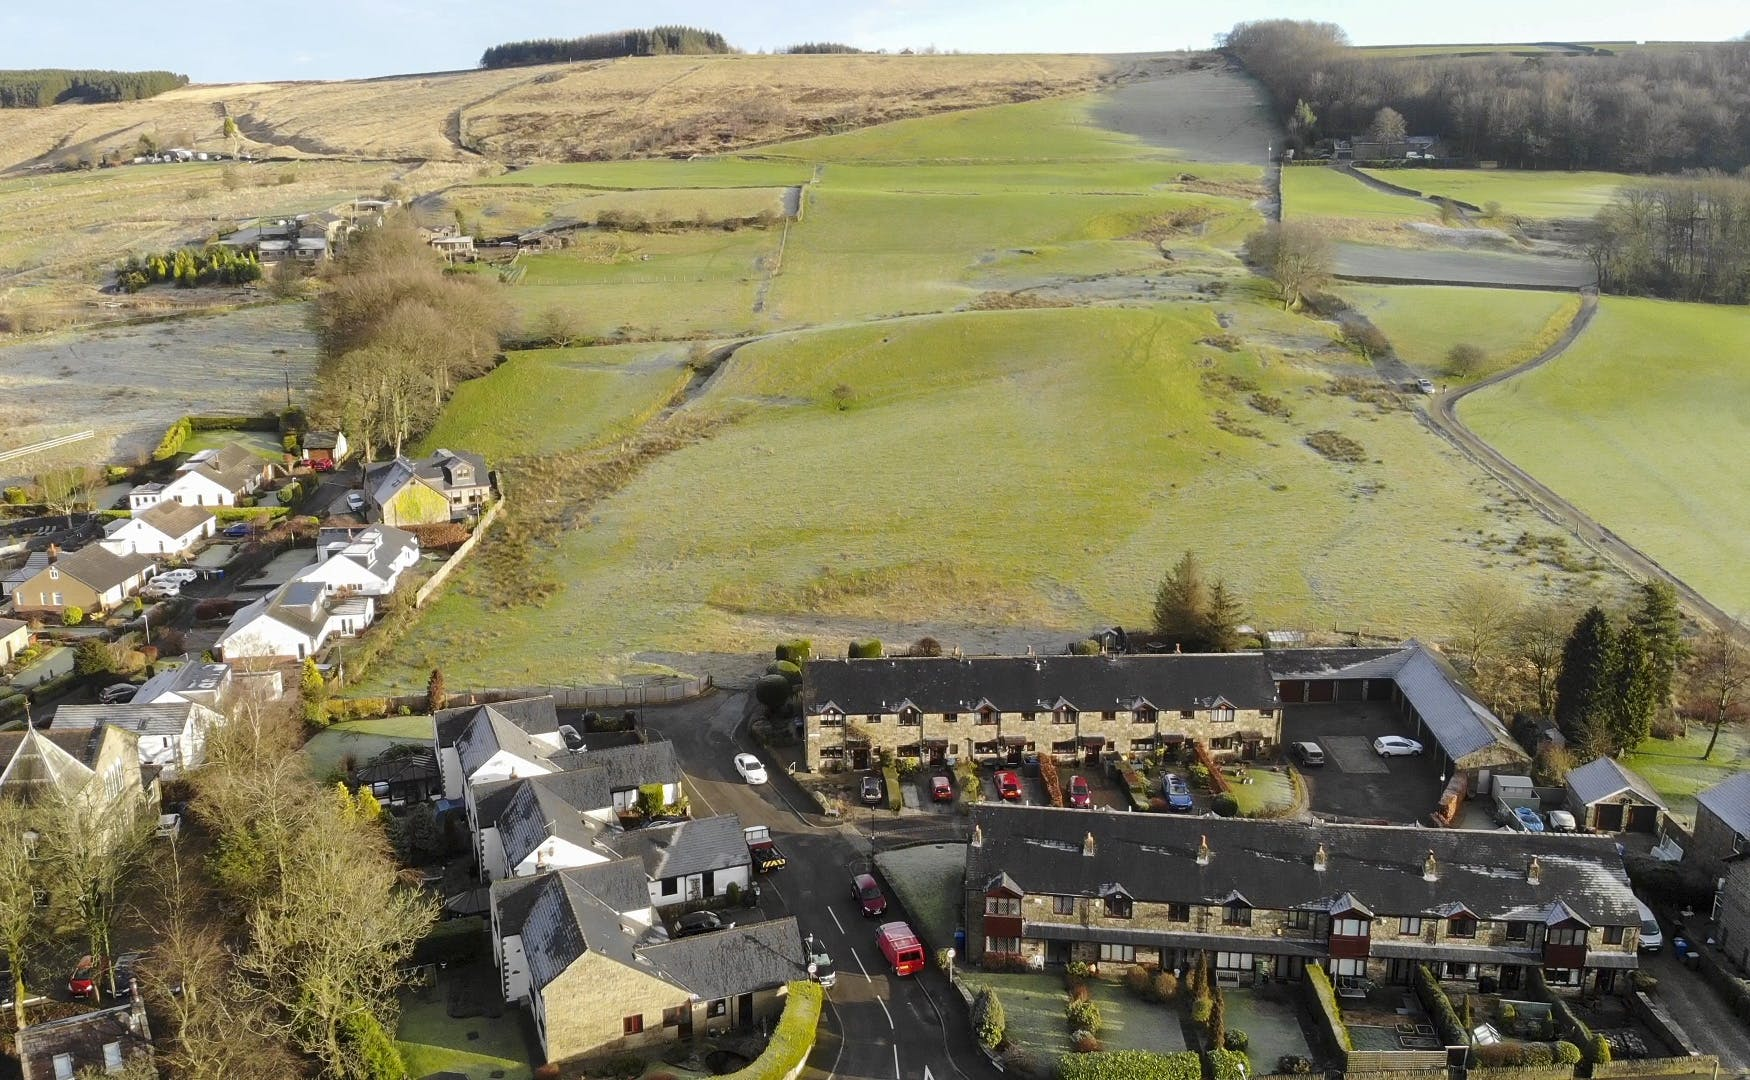 Newchurch Meadows, Johnny Barn Farm, Rossendale, Residential For Sale - 9_1.JPG